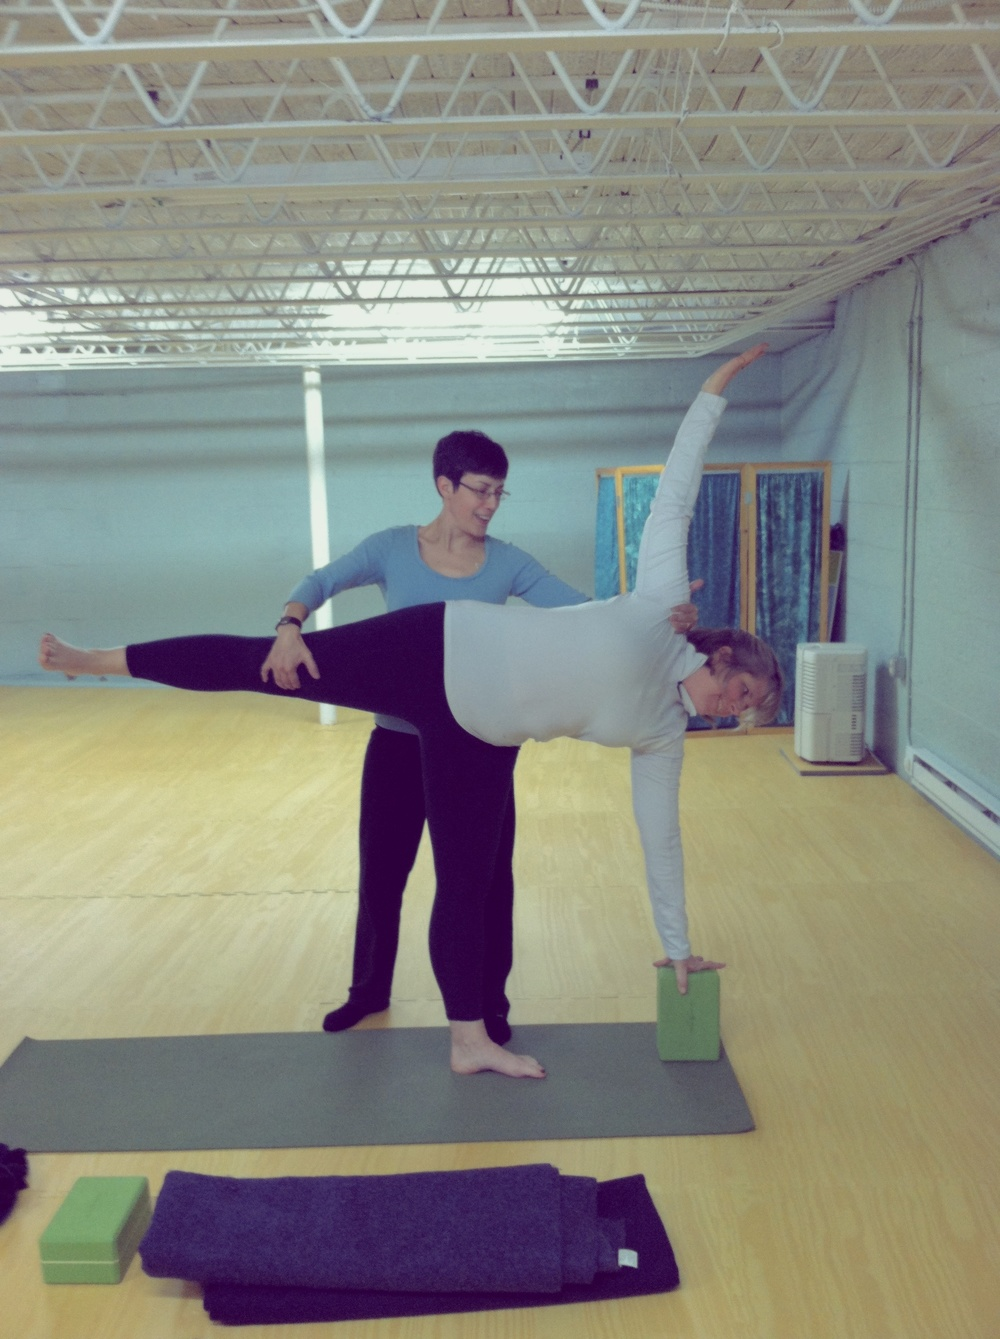 [2016.08.05] Yoga images14.jpg